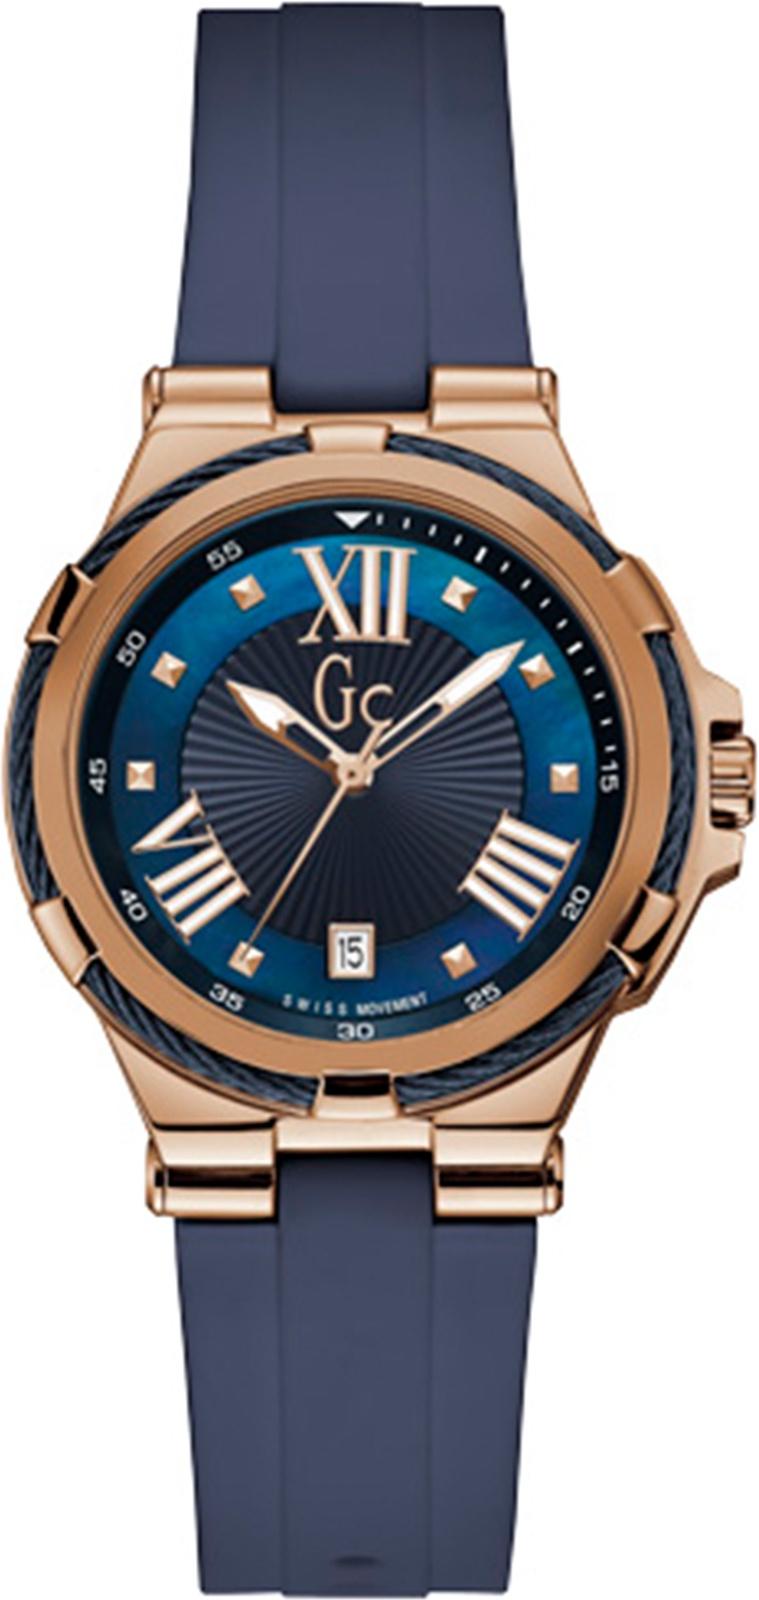 Часы Gc Structura Cable все цены